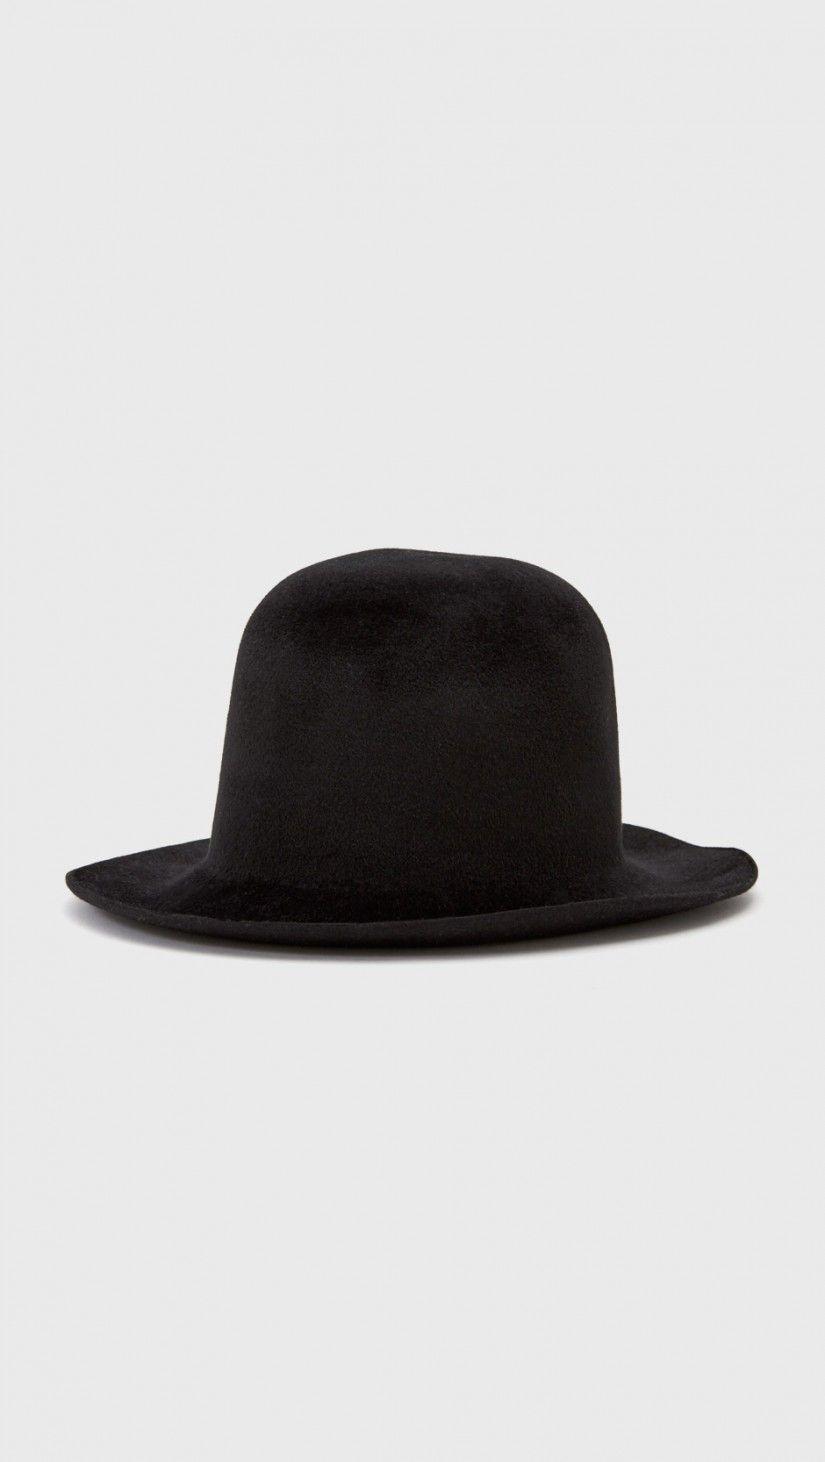 Reinhard Plank Ibro Melousine Hat in Black | The Dreslyn